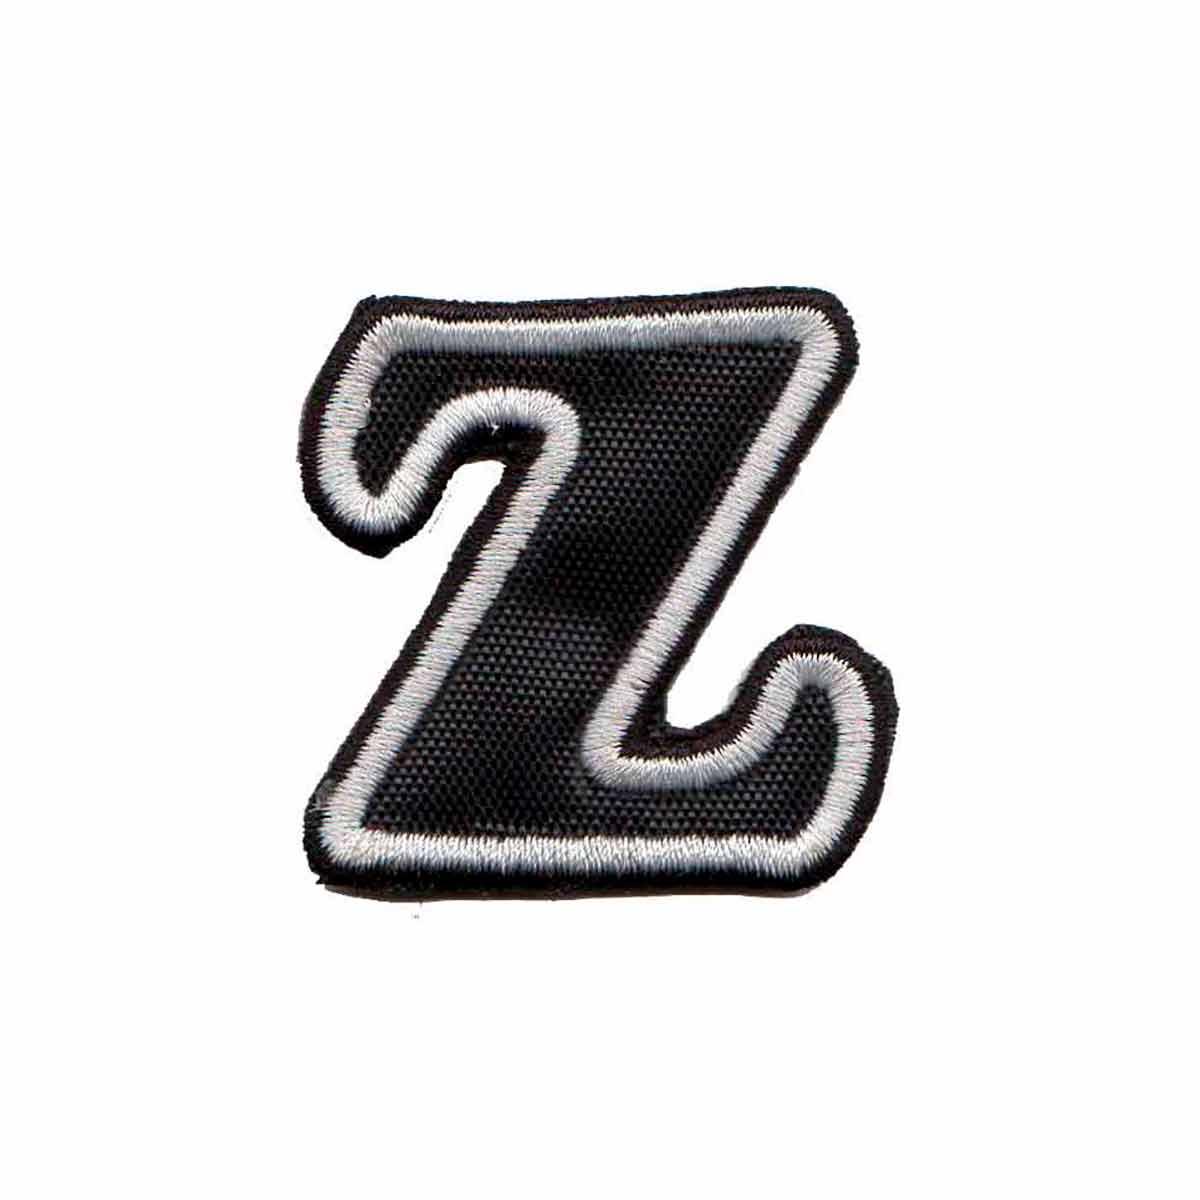 Patch Bordado - Letras Alfabeto Letra Z DV80539-419  - Talysmã Bordados